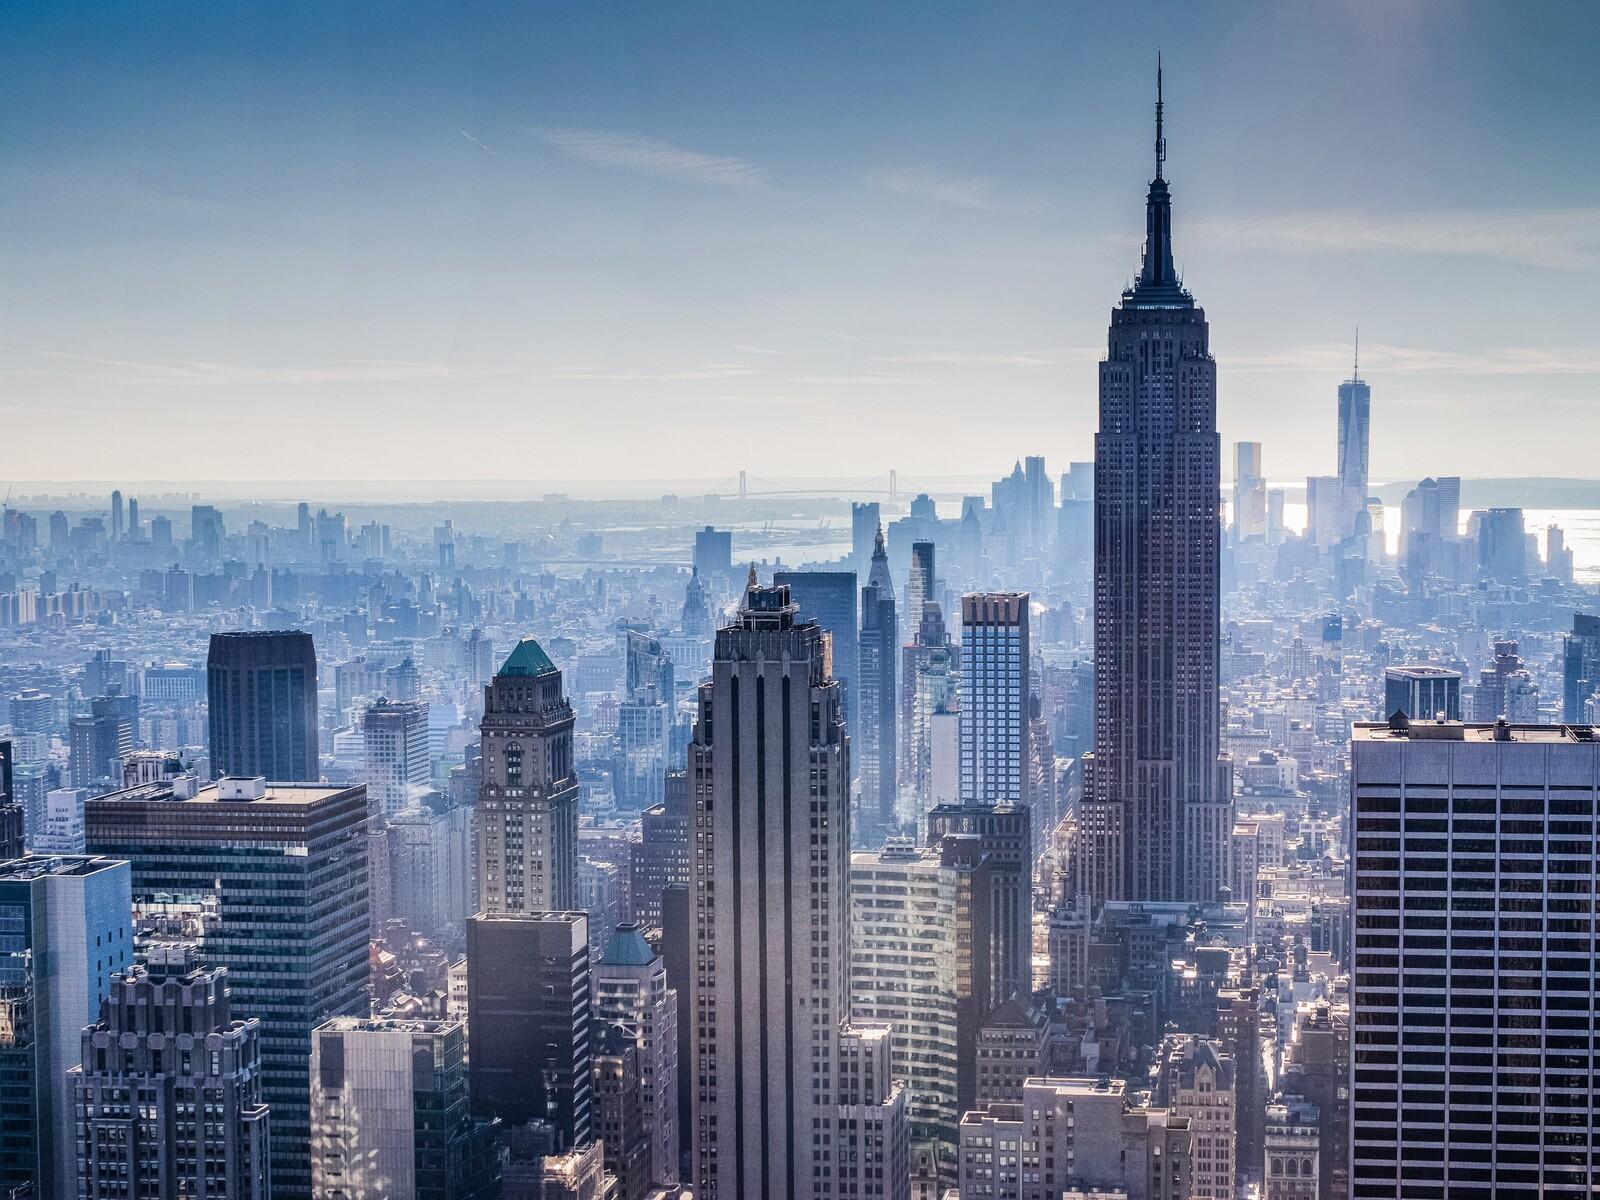 new-york-city-wide-8k-2z.jpg